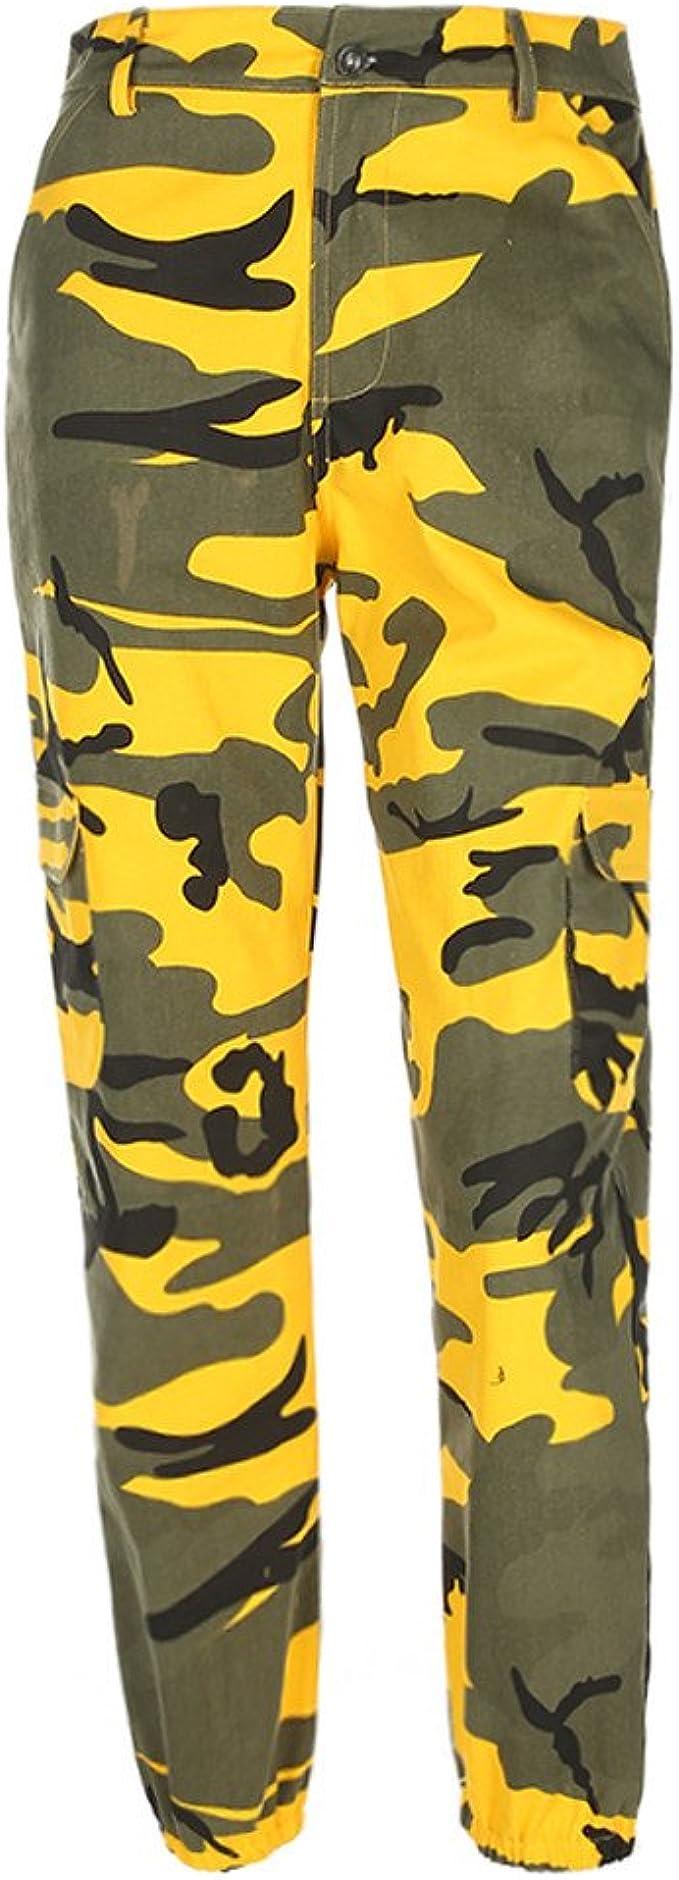 STRIR Pantalones de Mujer Camo Cargo Pantalones de Camuflaje ...